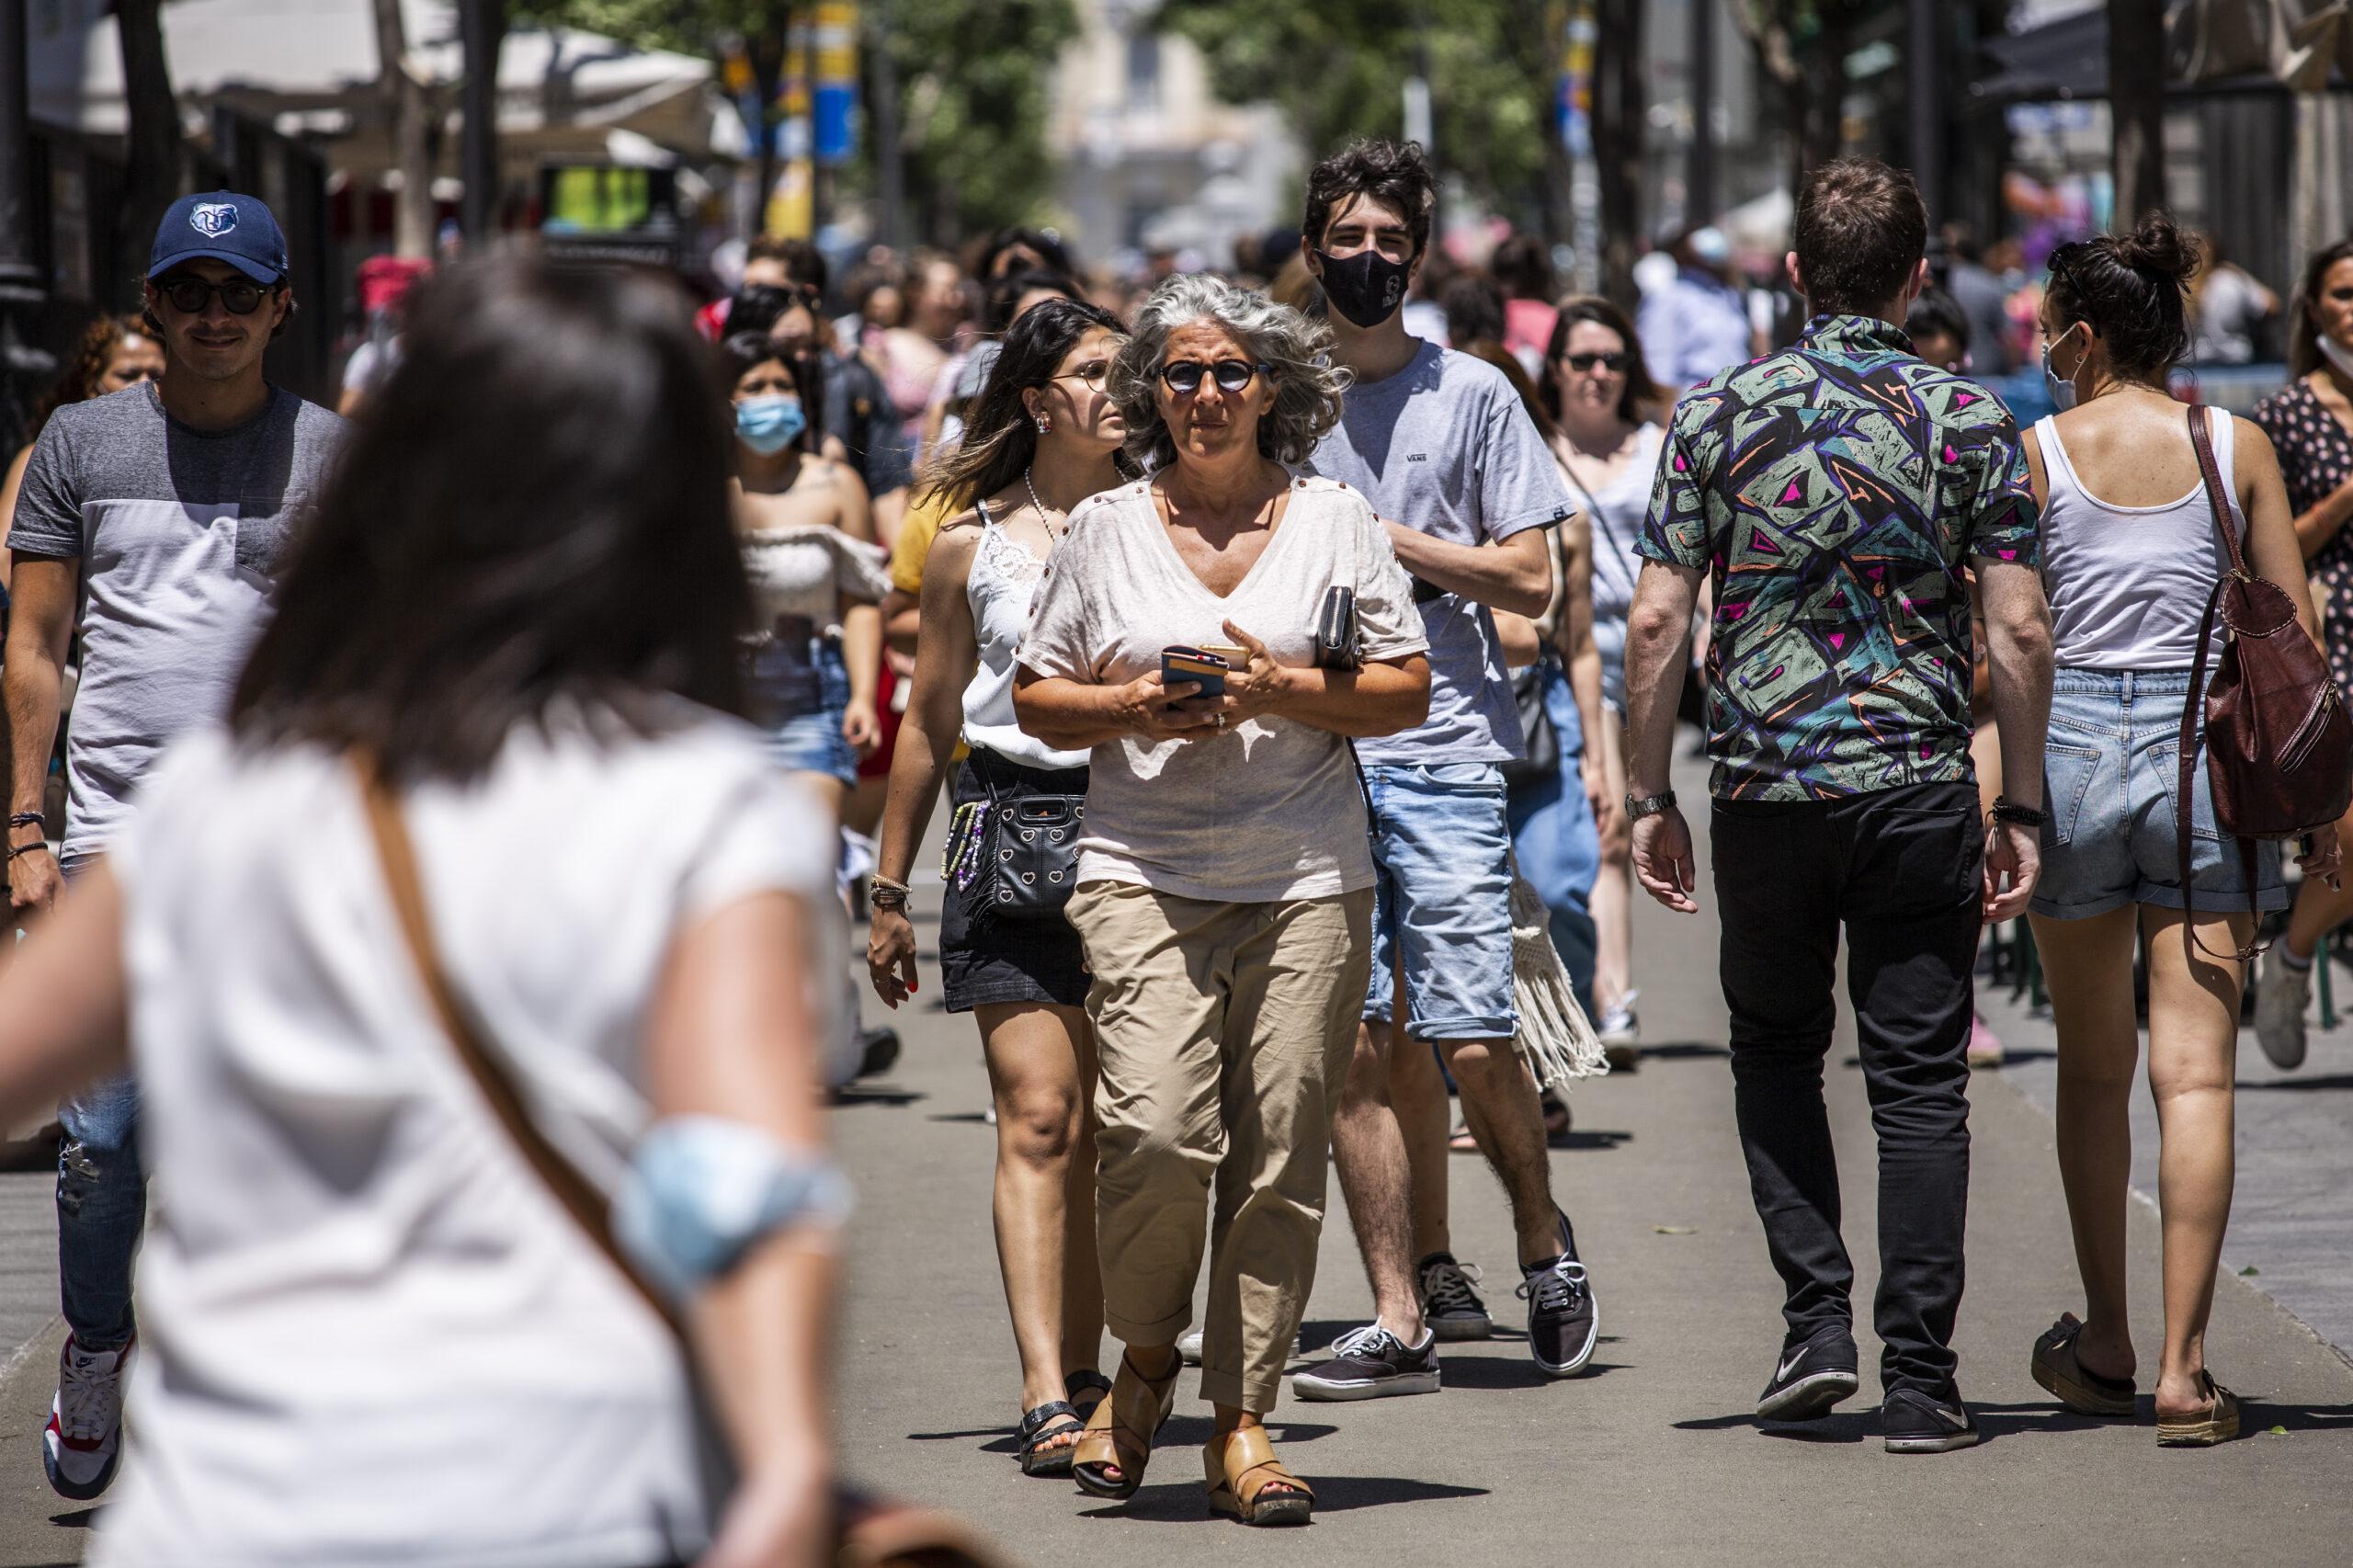 Una dona passeja sense mascareta a Madrid | Europa Press